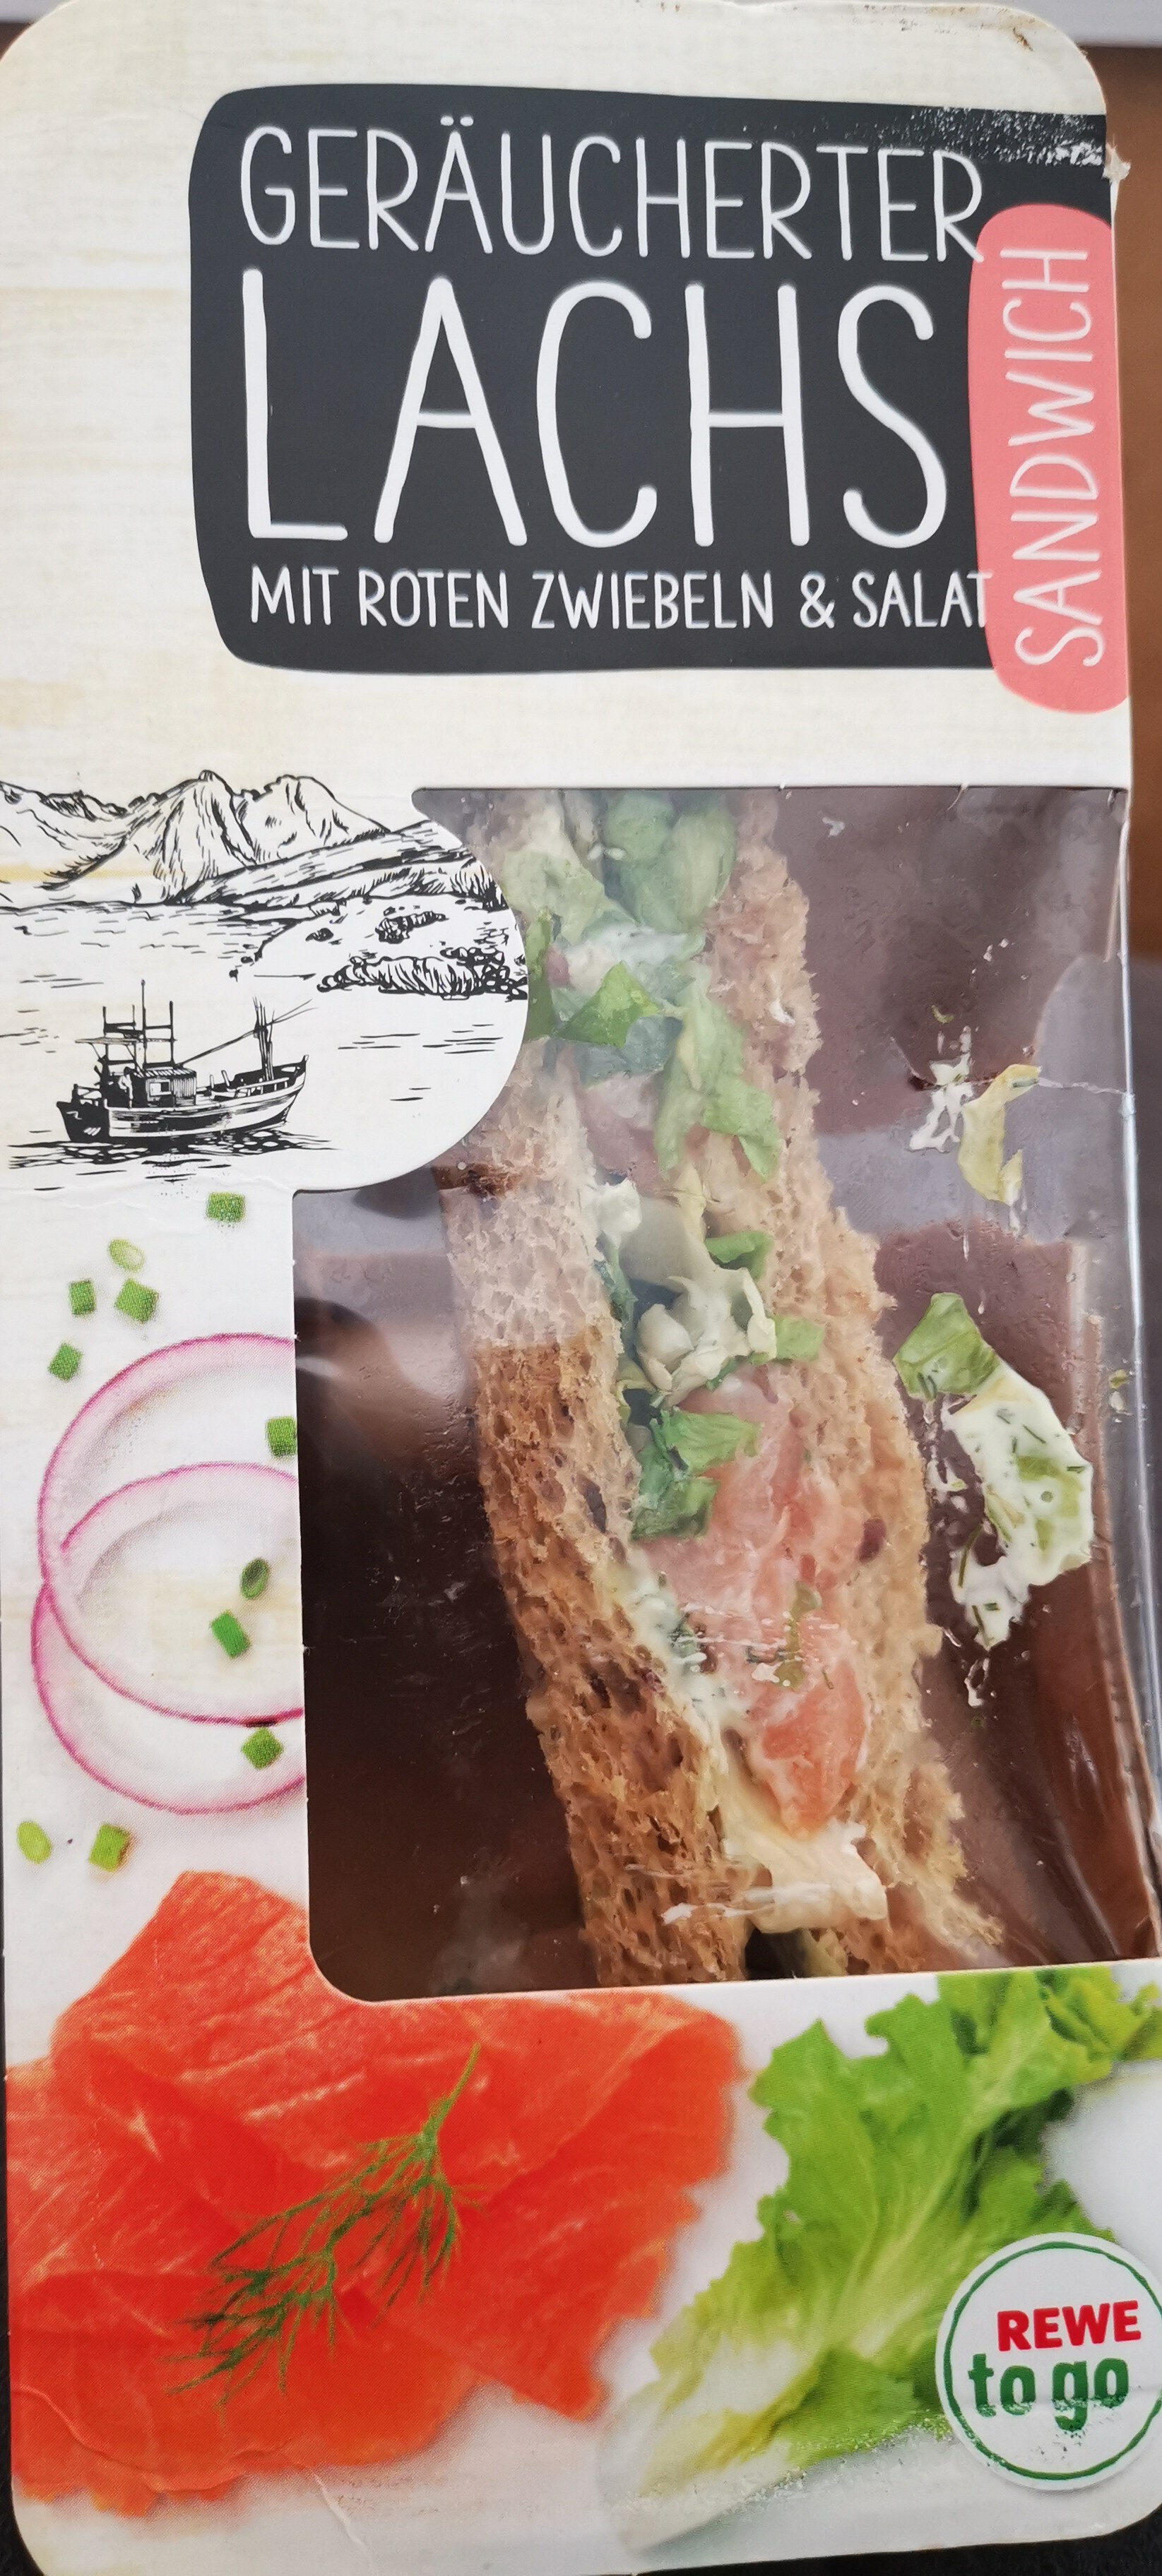 Sandwich geräucherter Lachs - Product - de